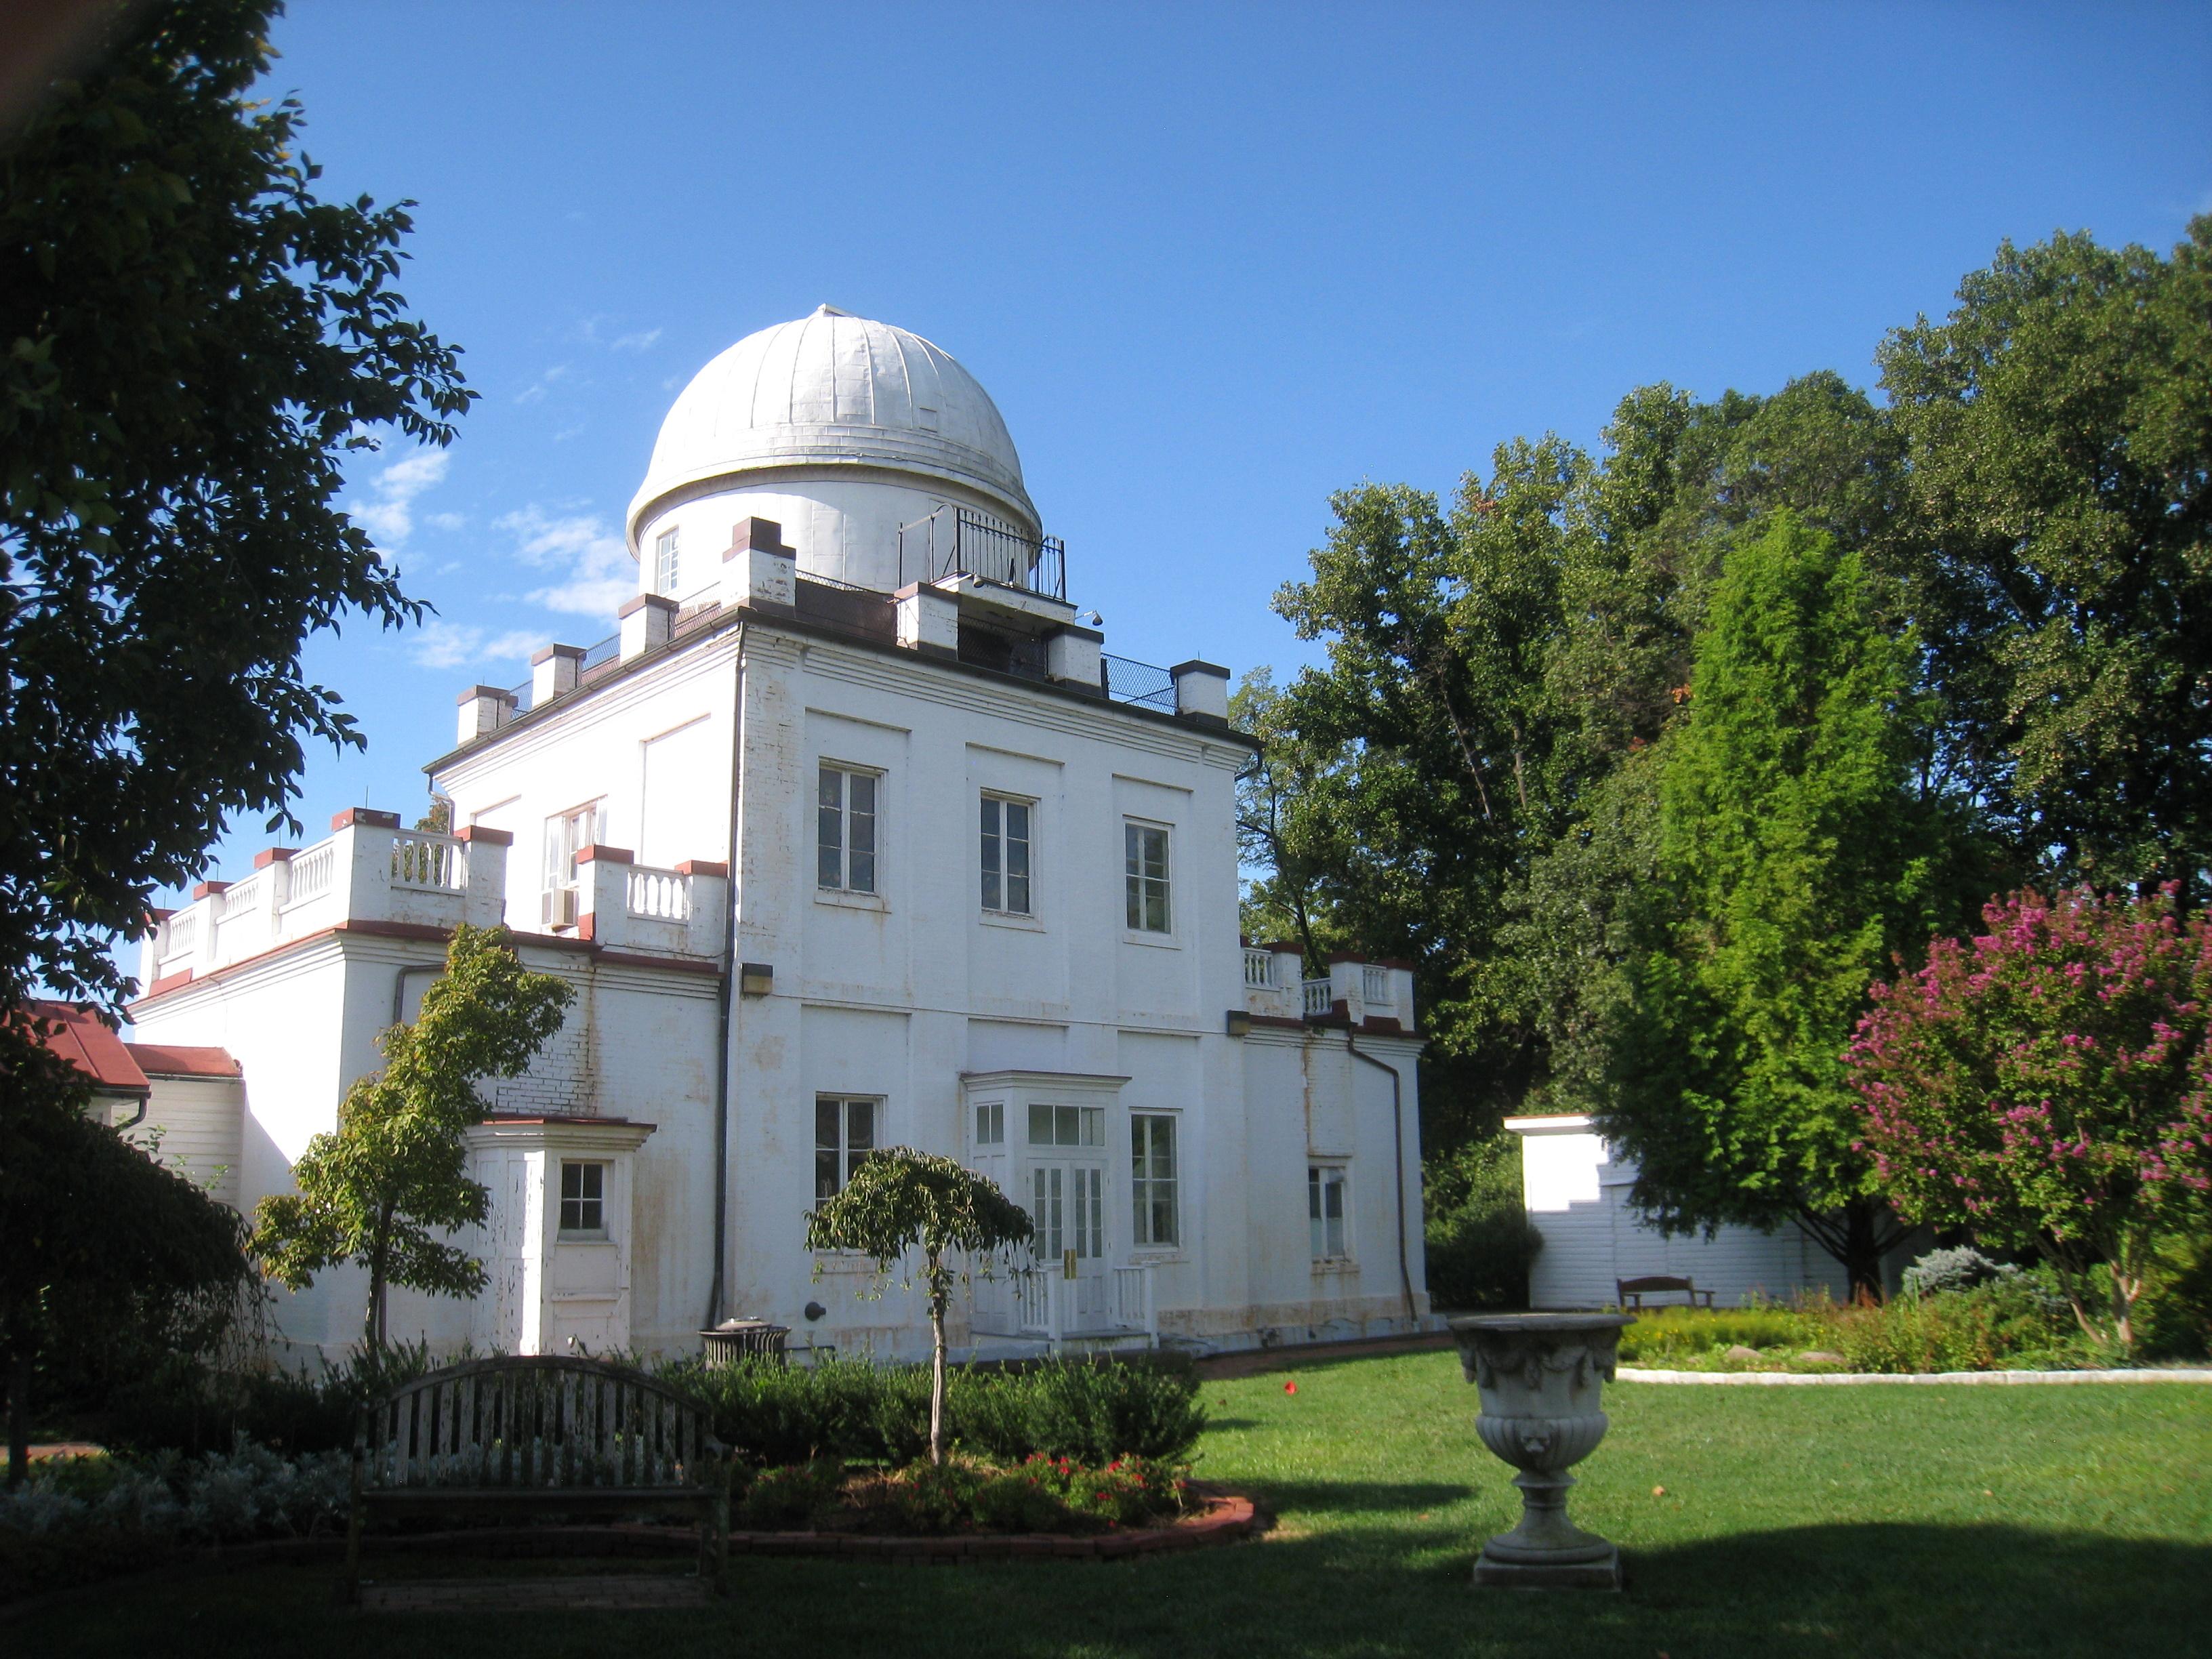 Georgetown University Astronomical Observatory | Mapio.net